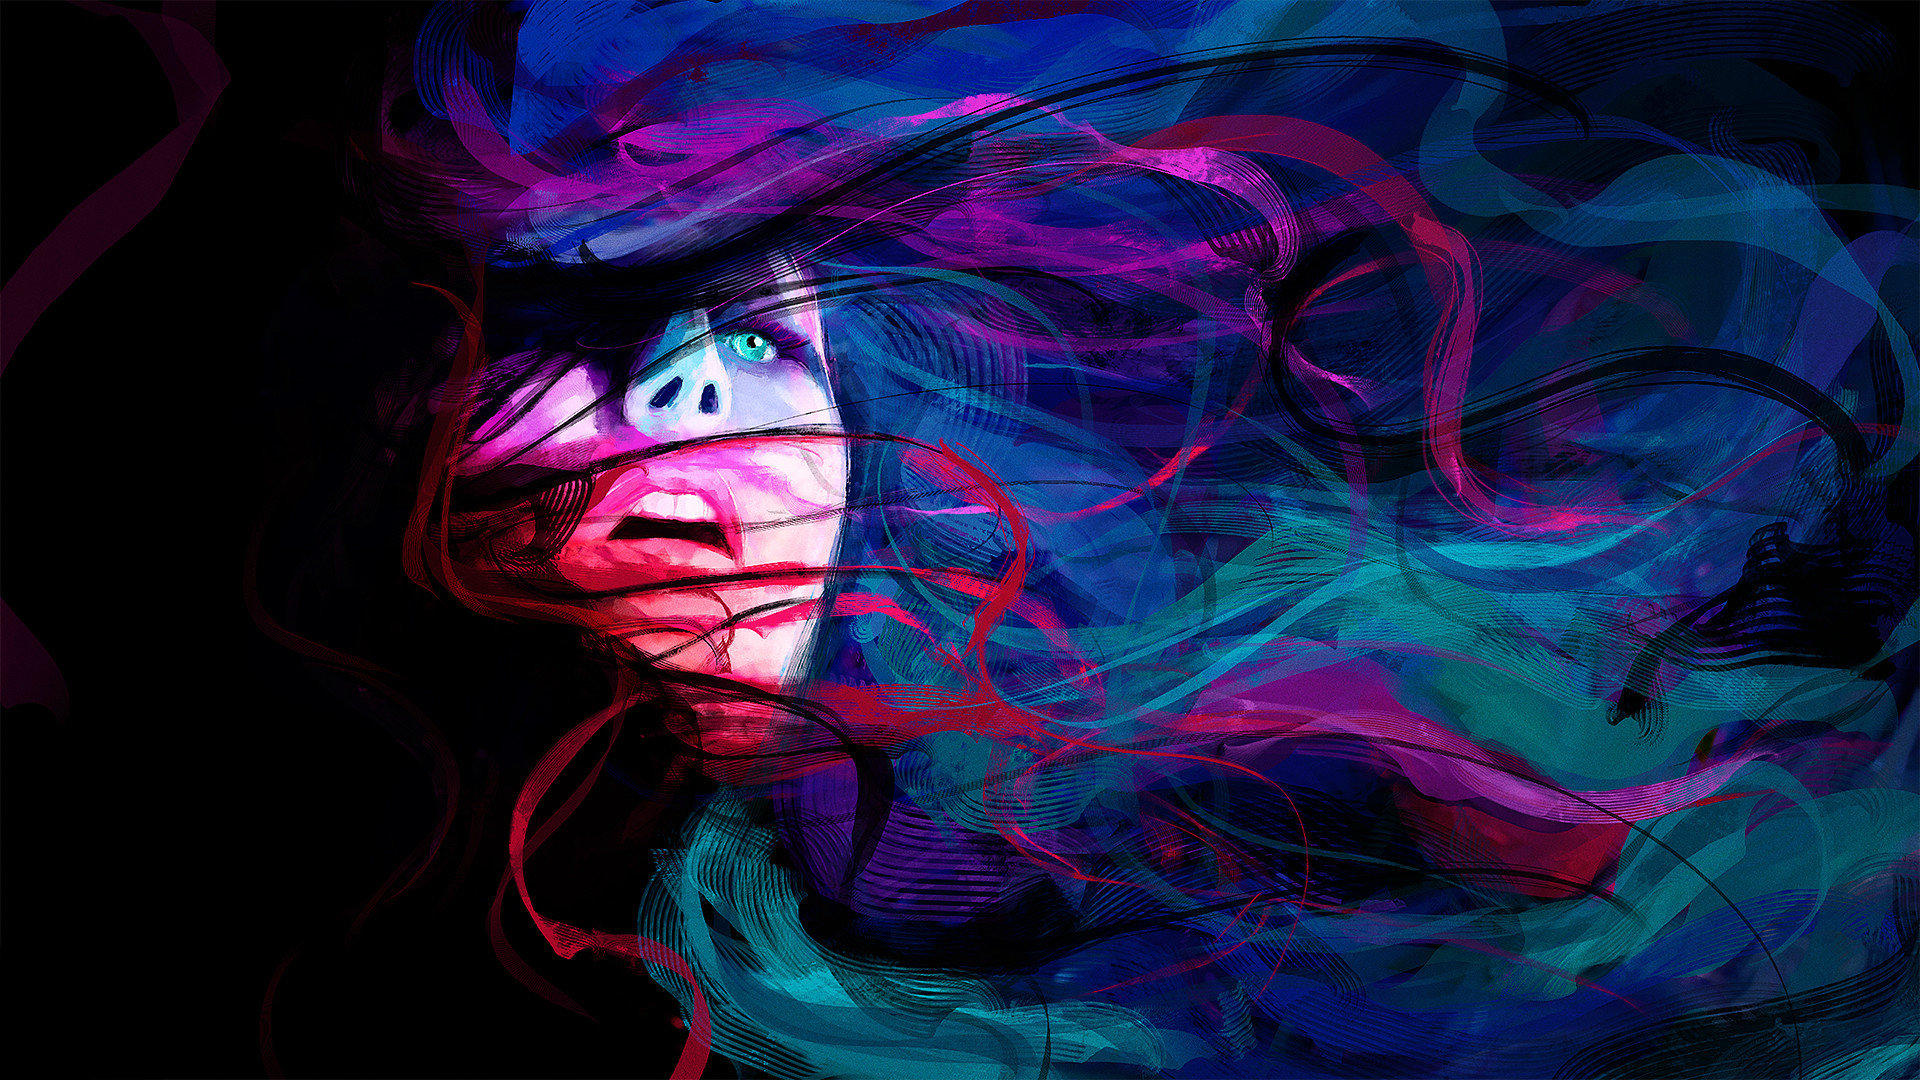 cool girls art wallpaper full hd 1920x1080 356168